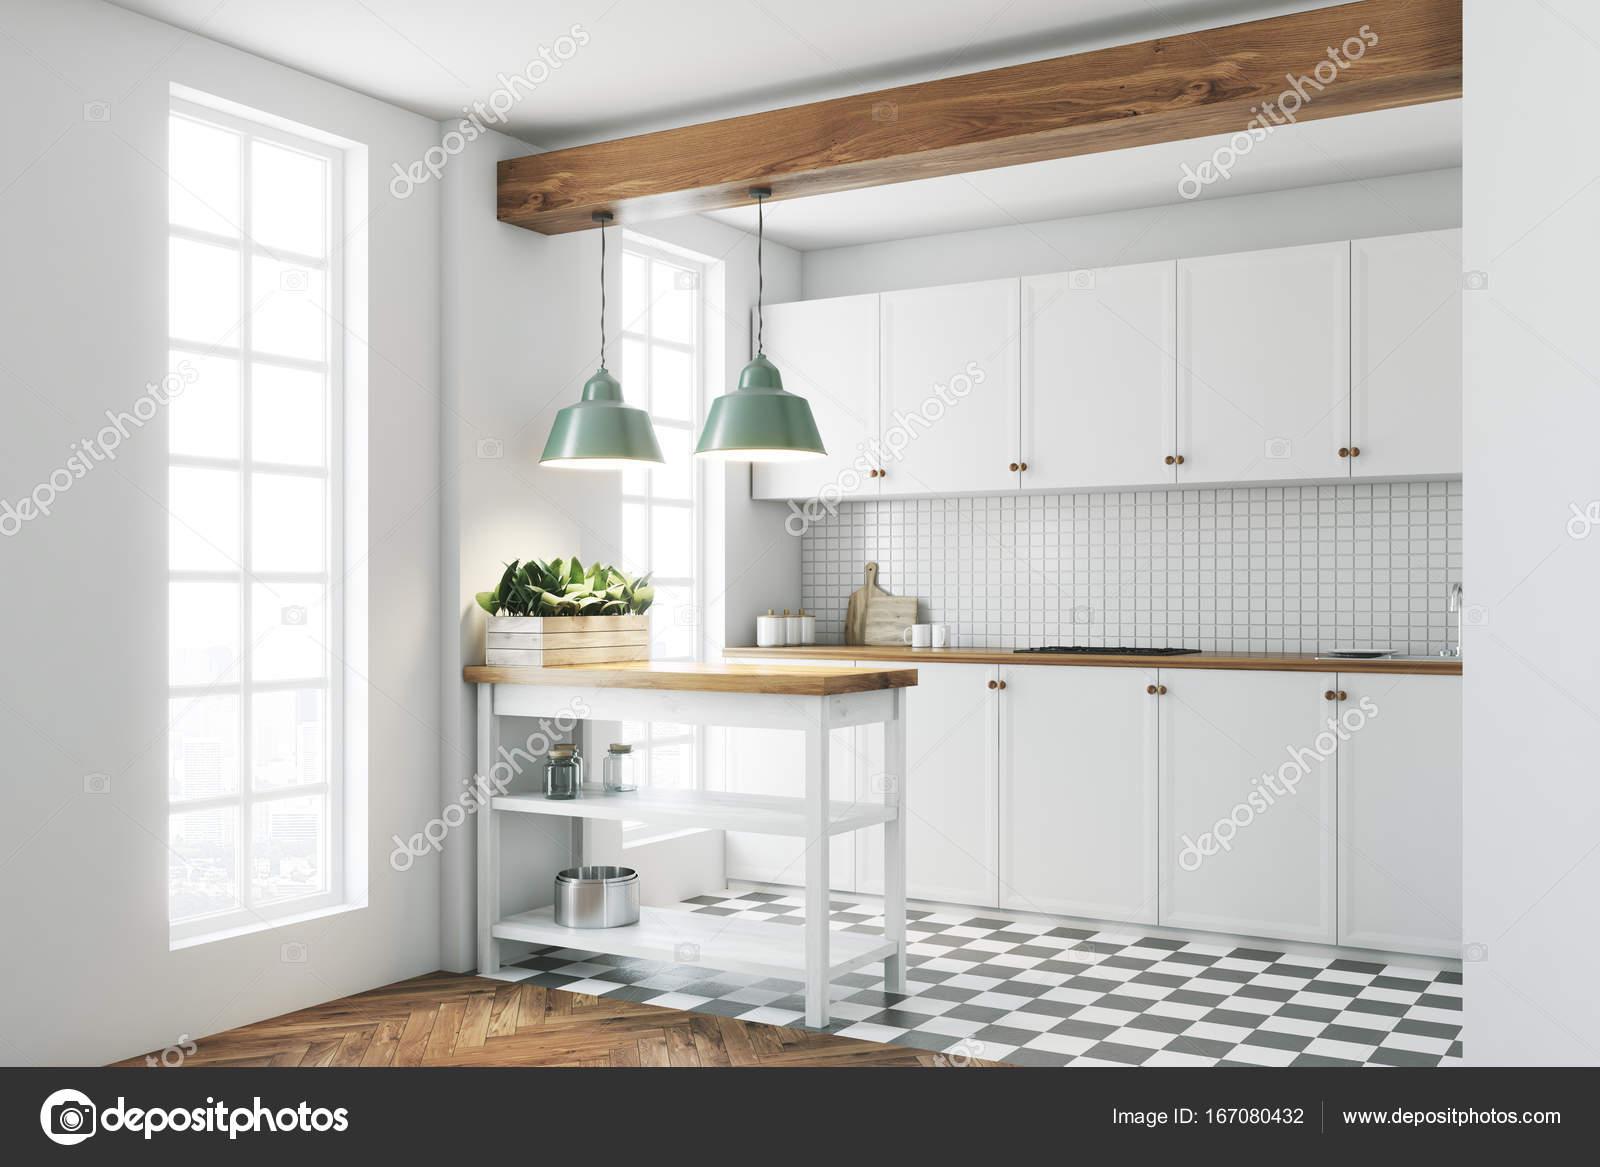 Piastrelle cucina bianca offerta scavolini basix sax cucine a